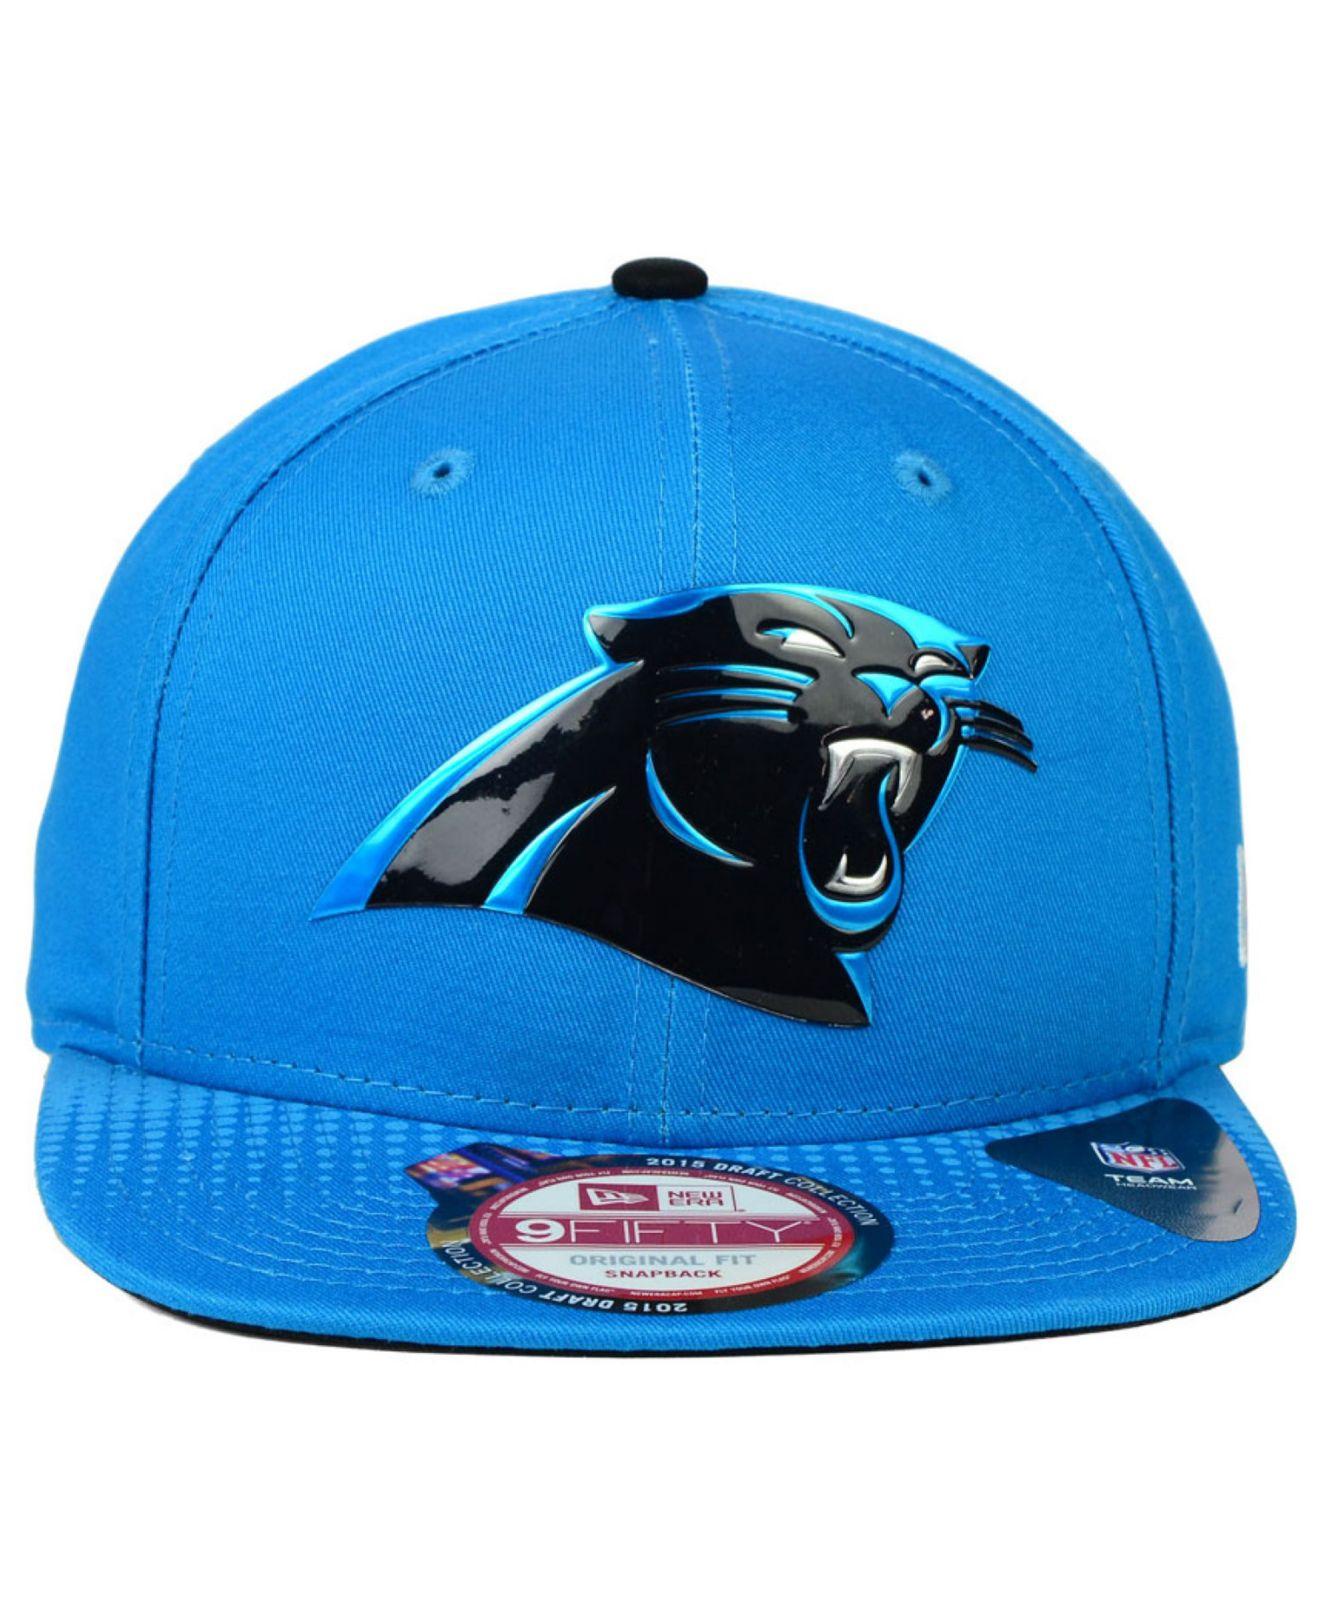 Lyst - KTZ Carolina Panthers 2015 Nfl Draft 9fifty Snapback Cap in ... ab9daea8159